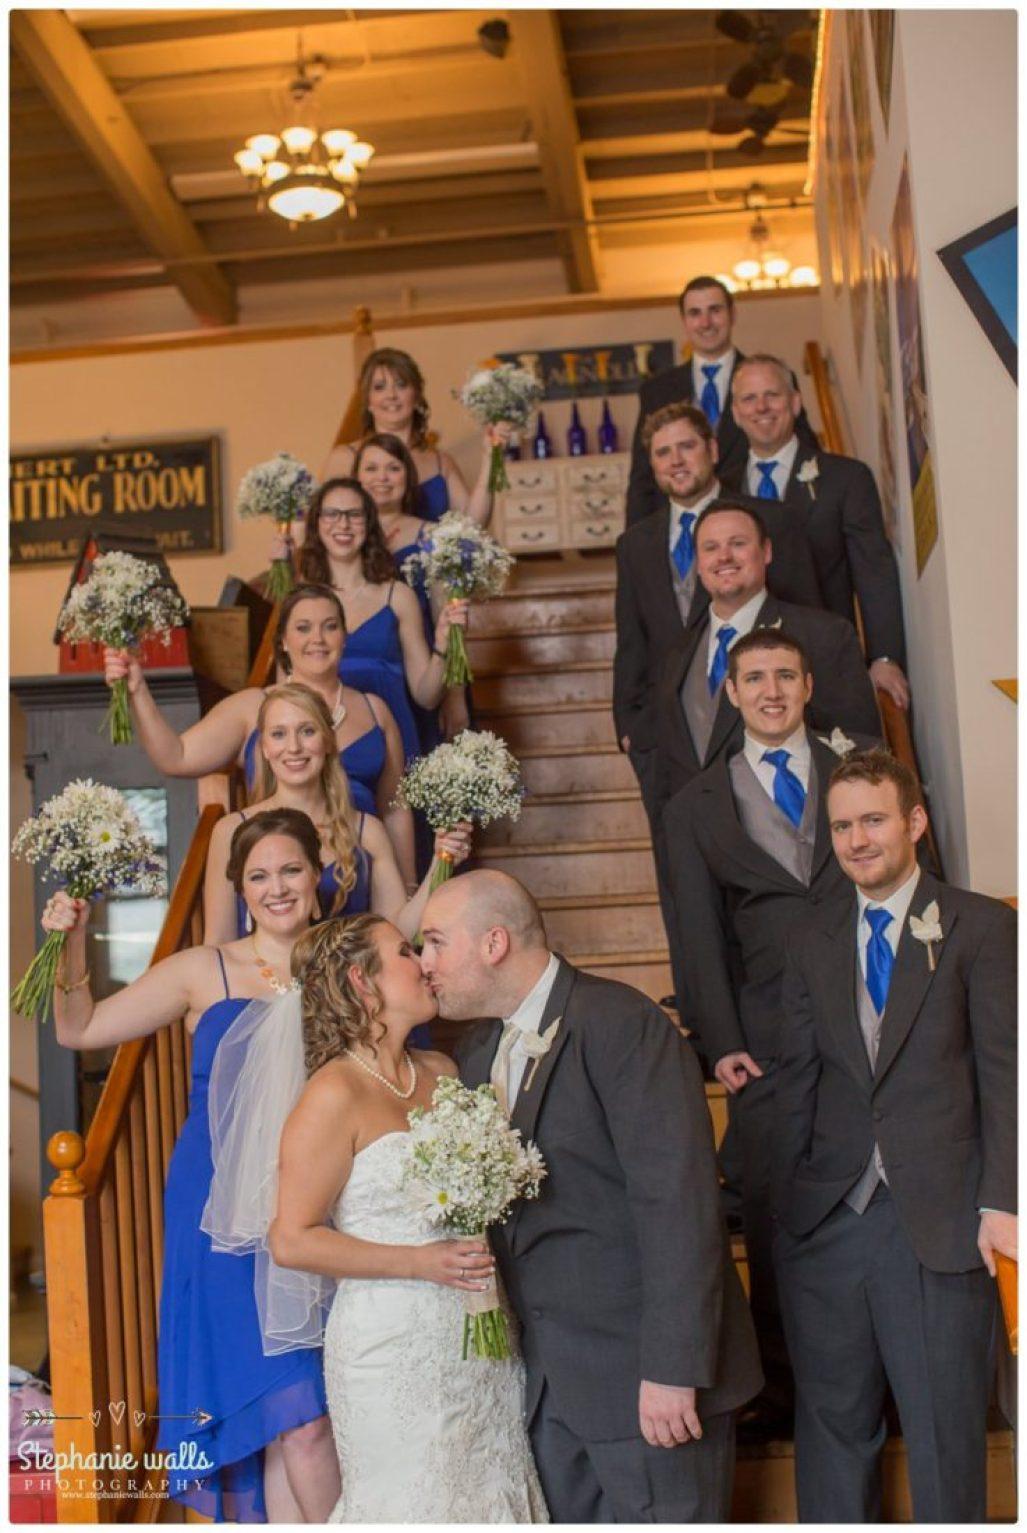 2016 03 24 0103 Racing Love   Snohomish Event Center   Snohomish Wedding Photographer